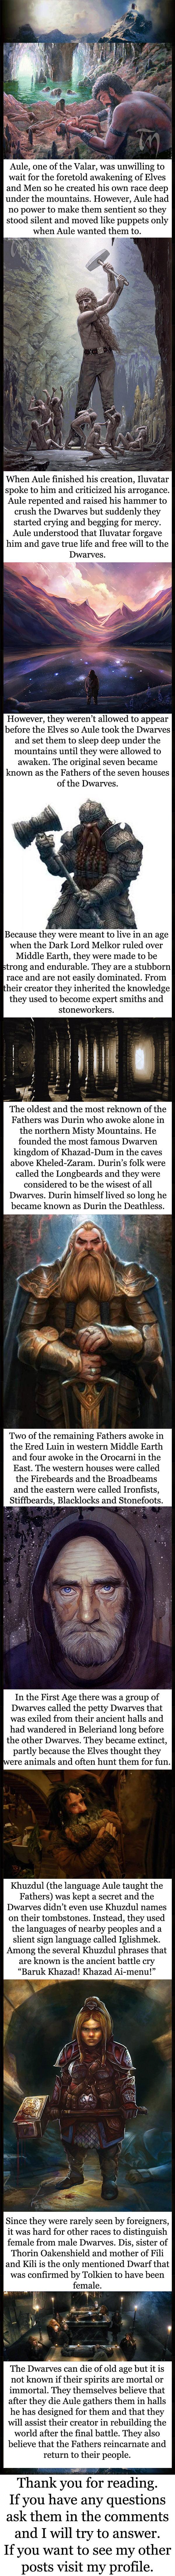 Tolkien lore - The Dwarves - 9GAG